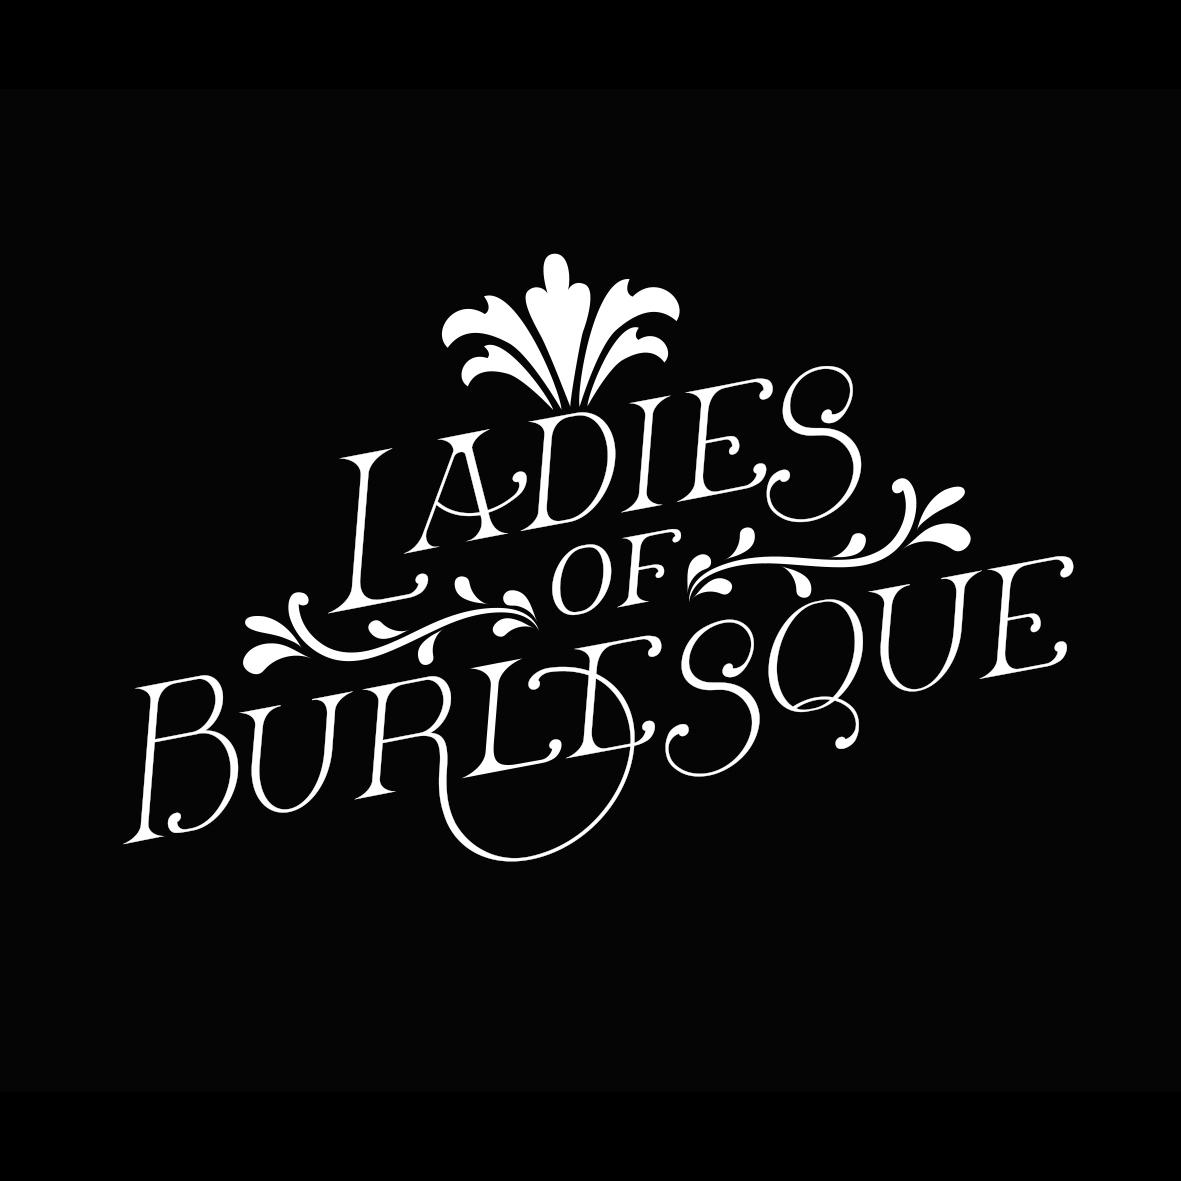 hello@ladiesofburlesque.com